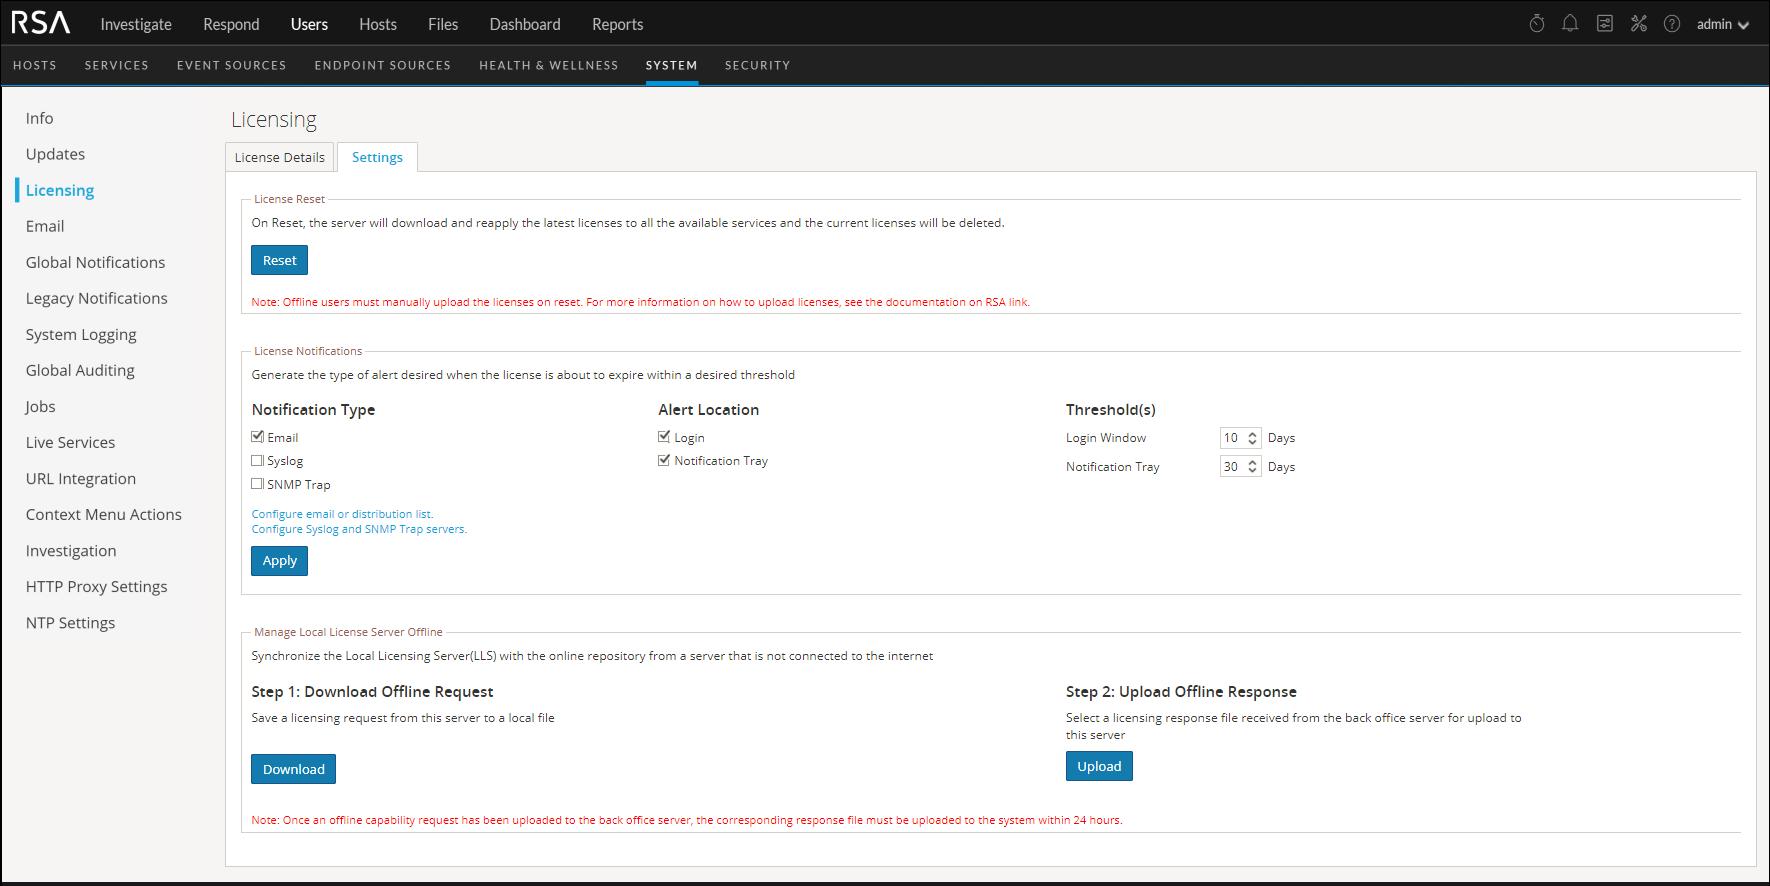 Licensing Notifications screen is displayed.